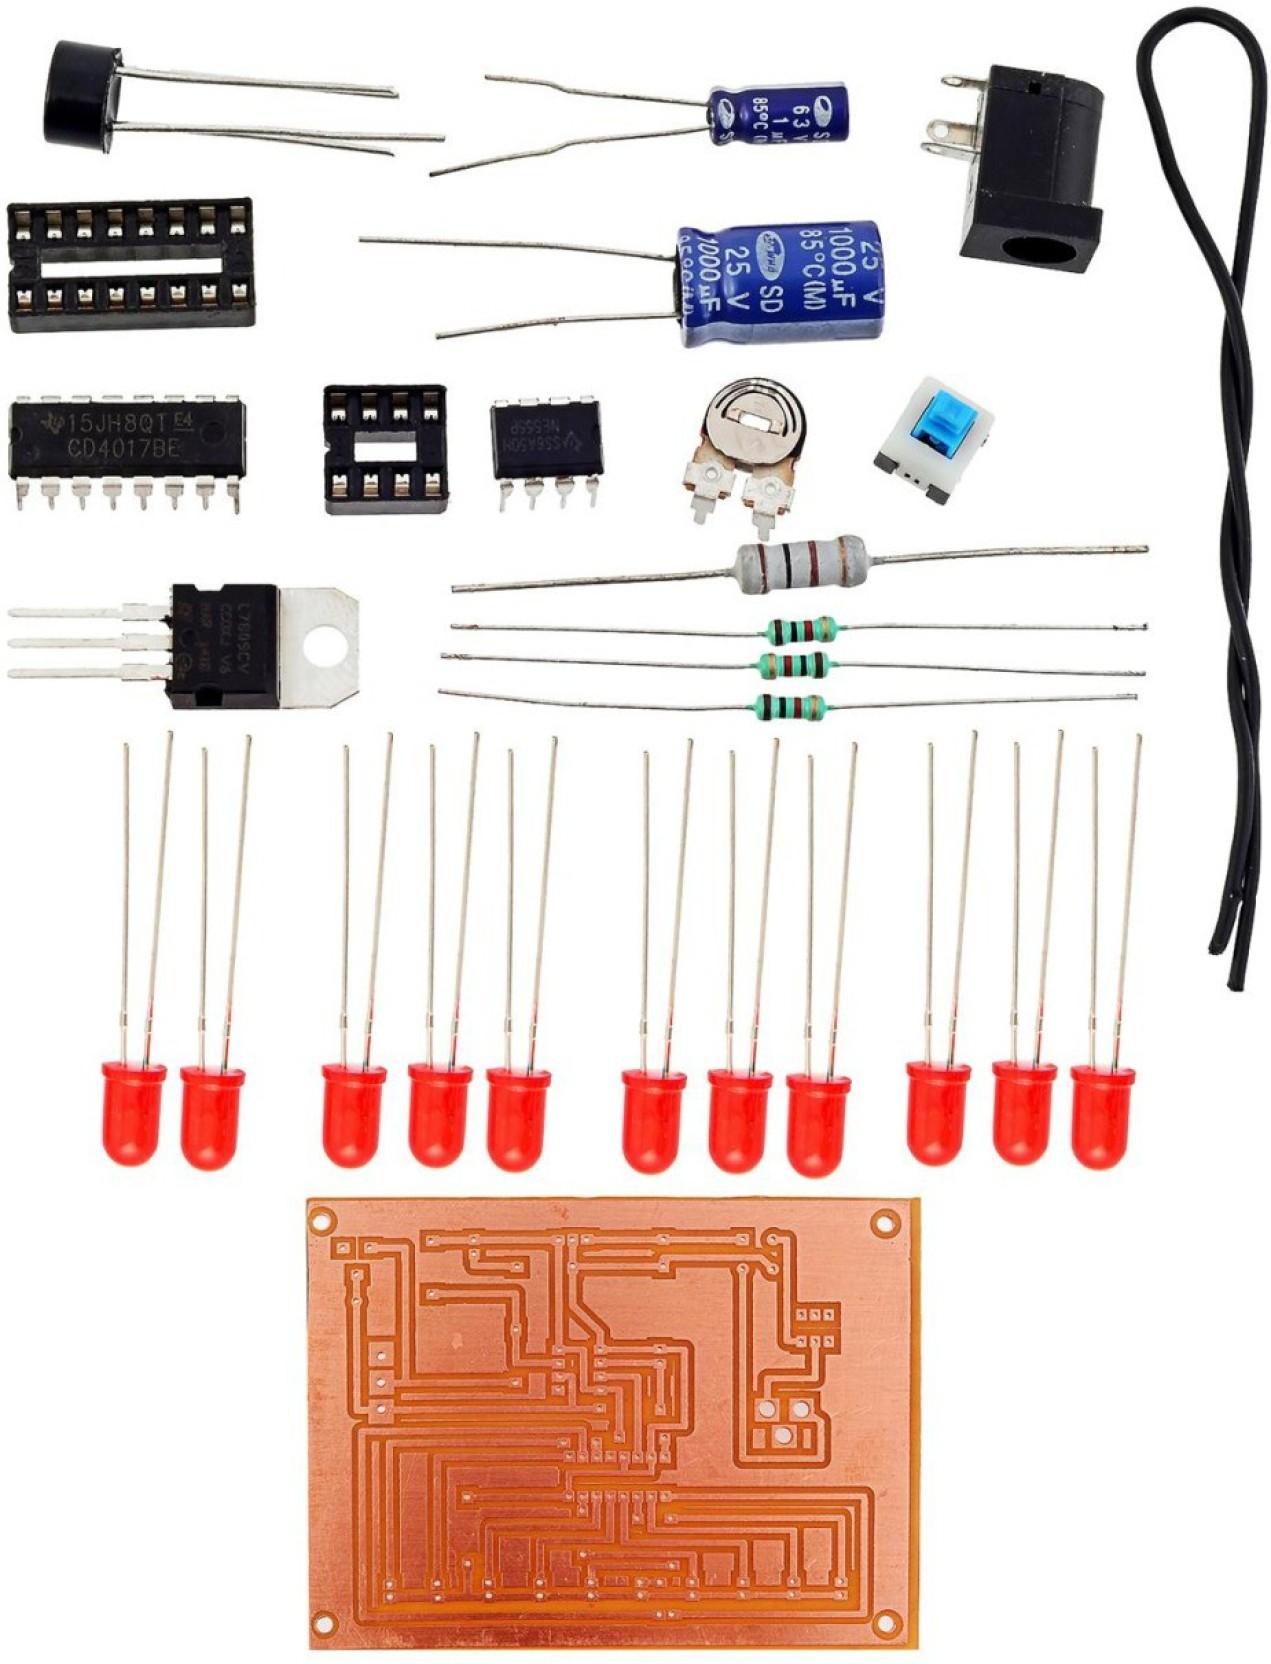 Kitsguru Led Chaser With Variable Speed Lgkt078 Educational Sound To Light Converter Circuit Diagram Add Cart